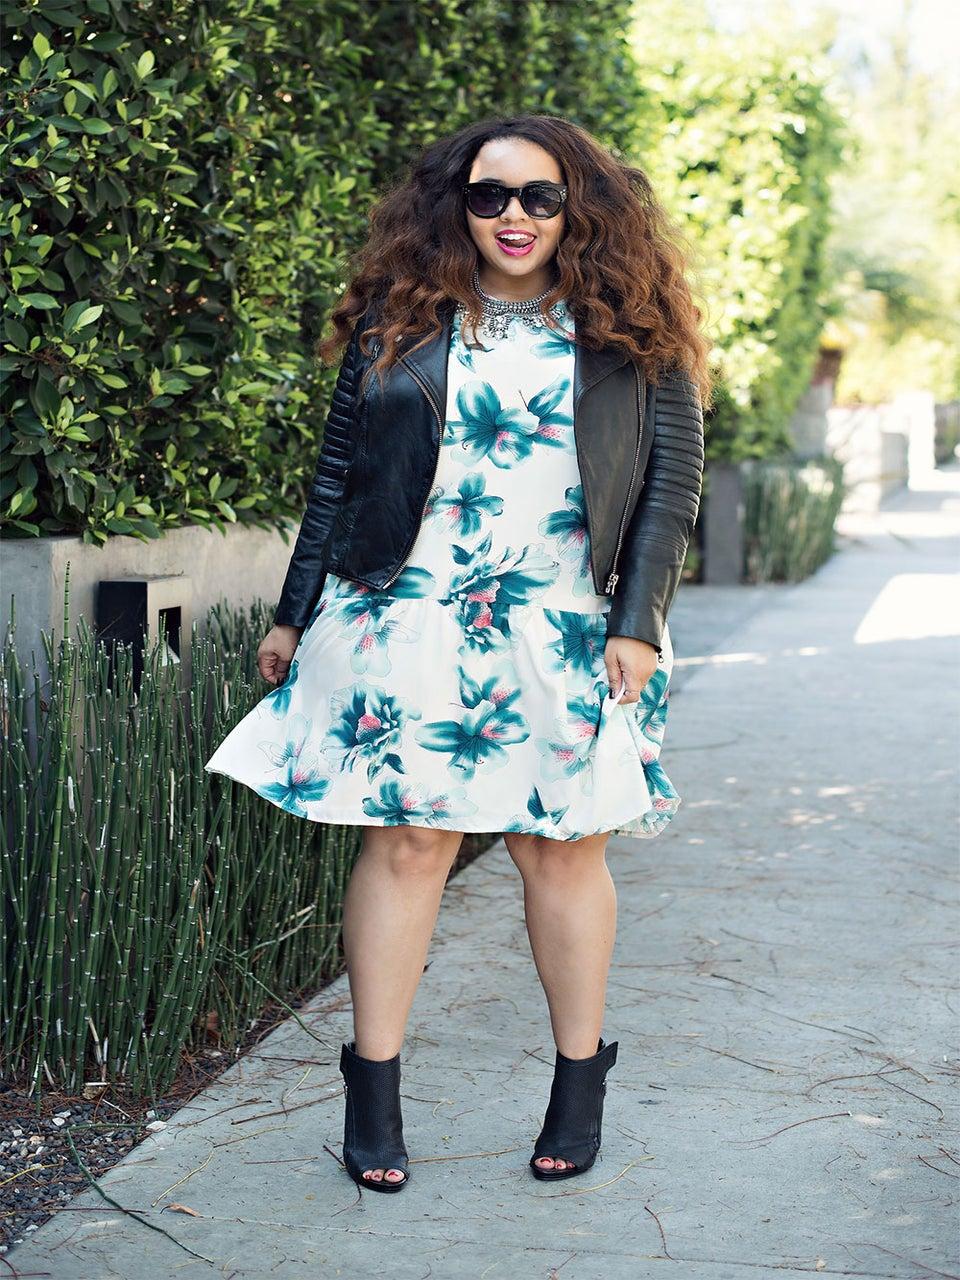 Elizabeth Arden Gets Digital Makeover Featuring Blogger Gabi Fresh